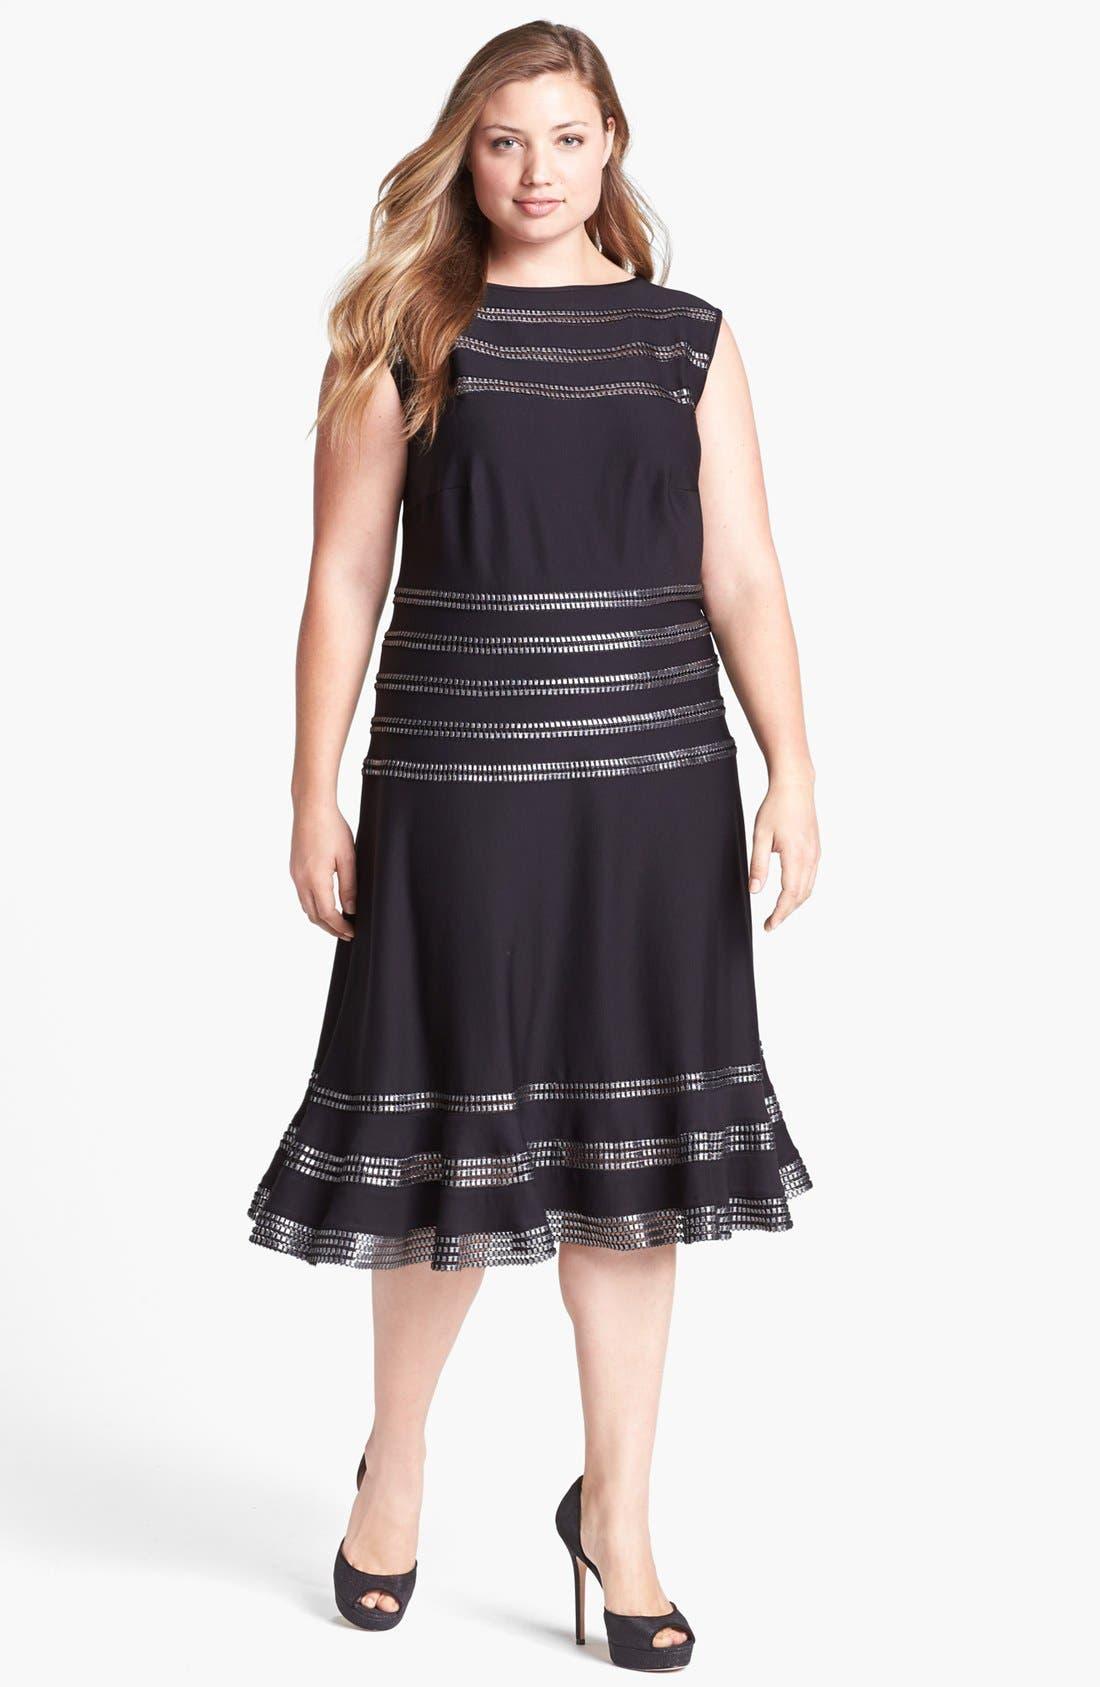 Alternate Image 1 Selected - Tadashi Shoji Foil Banded Fit & Flare Dress (Plus Size)